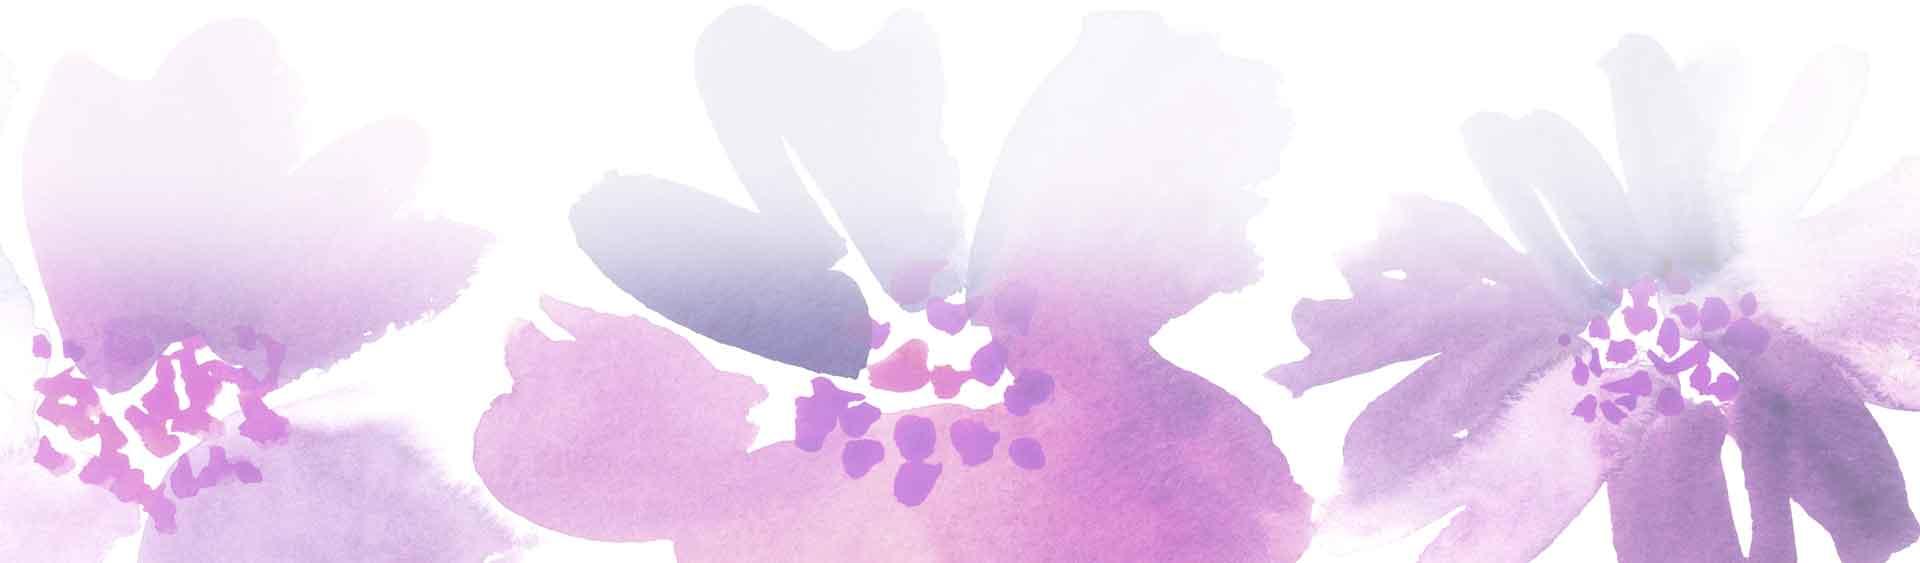 Blossom for Success by Nancy Rae Lohman | Flower Banner